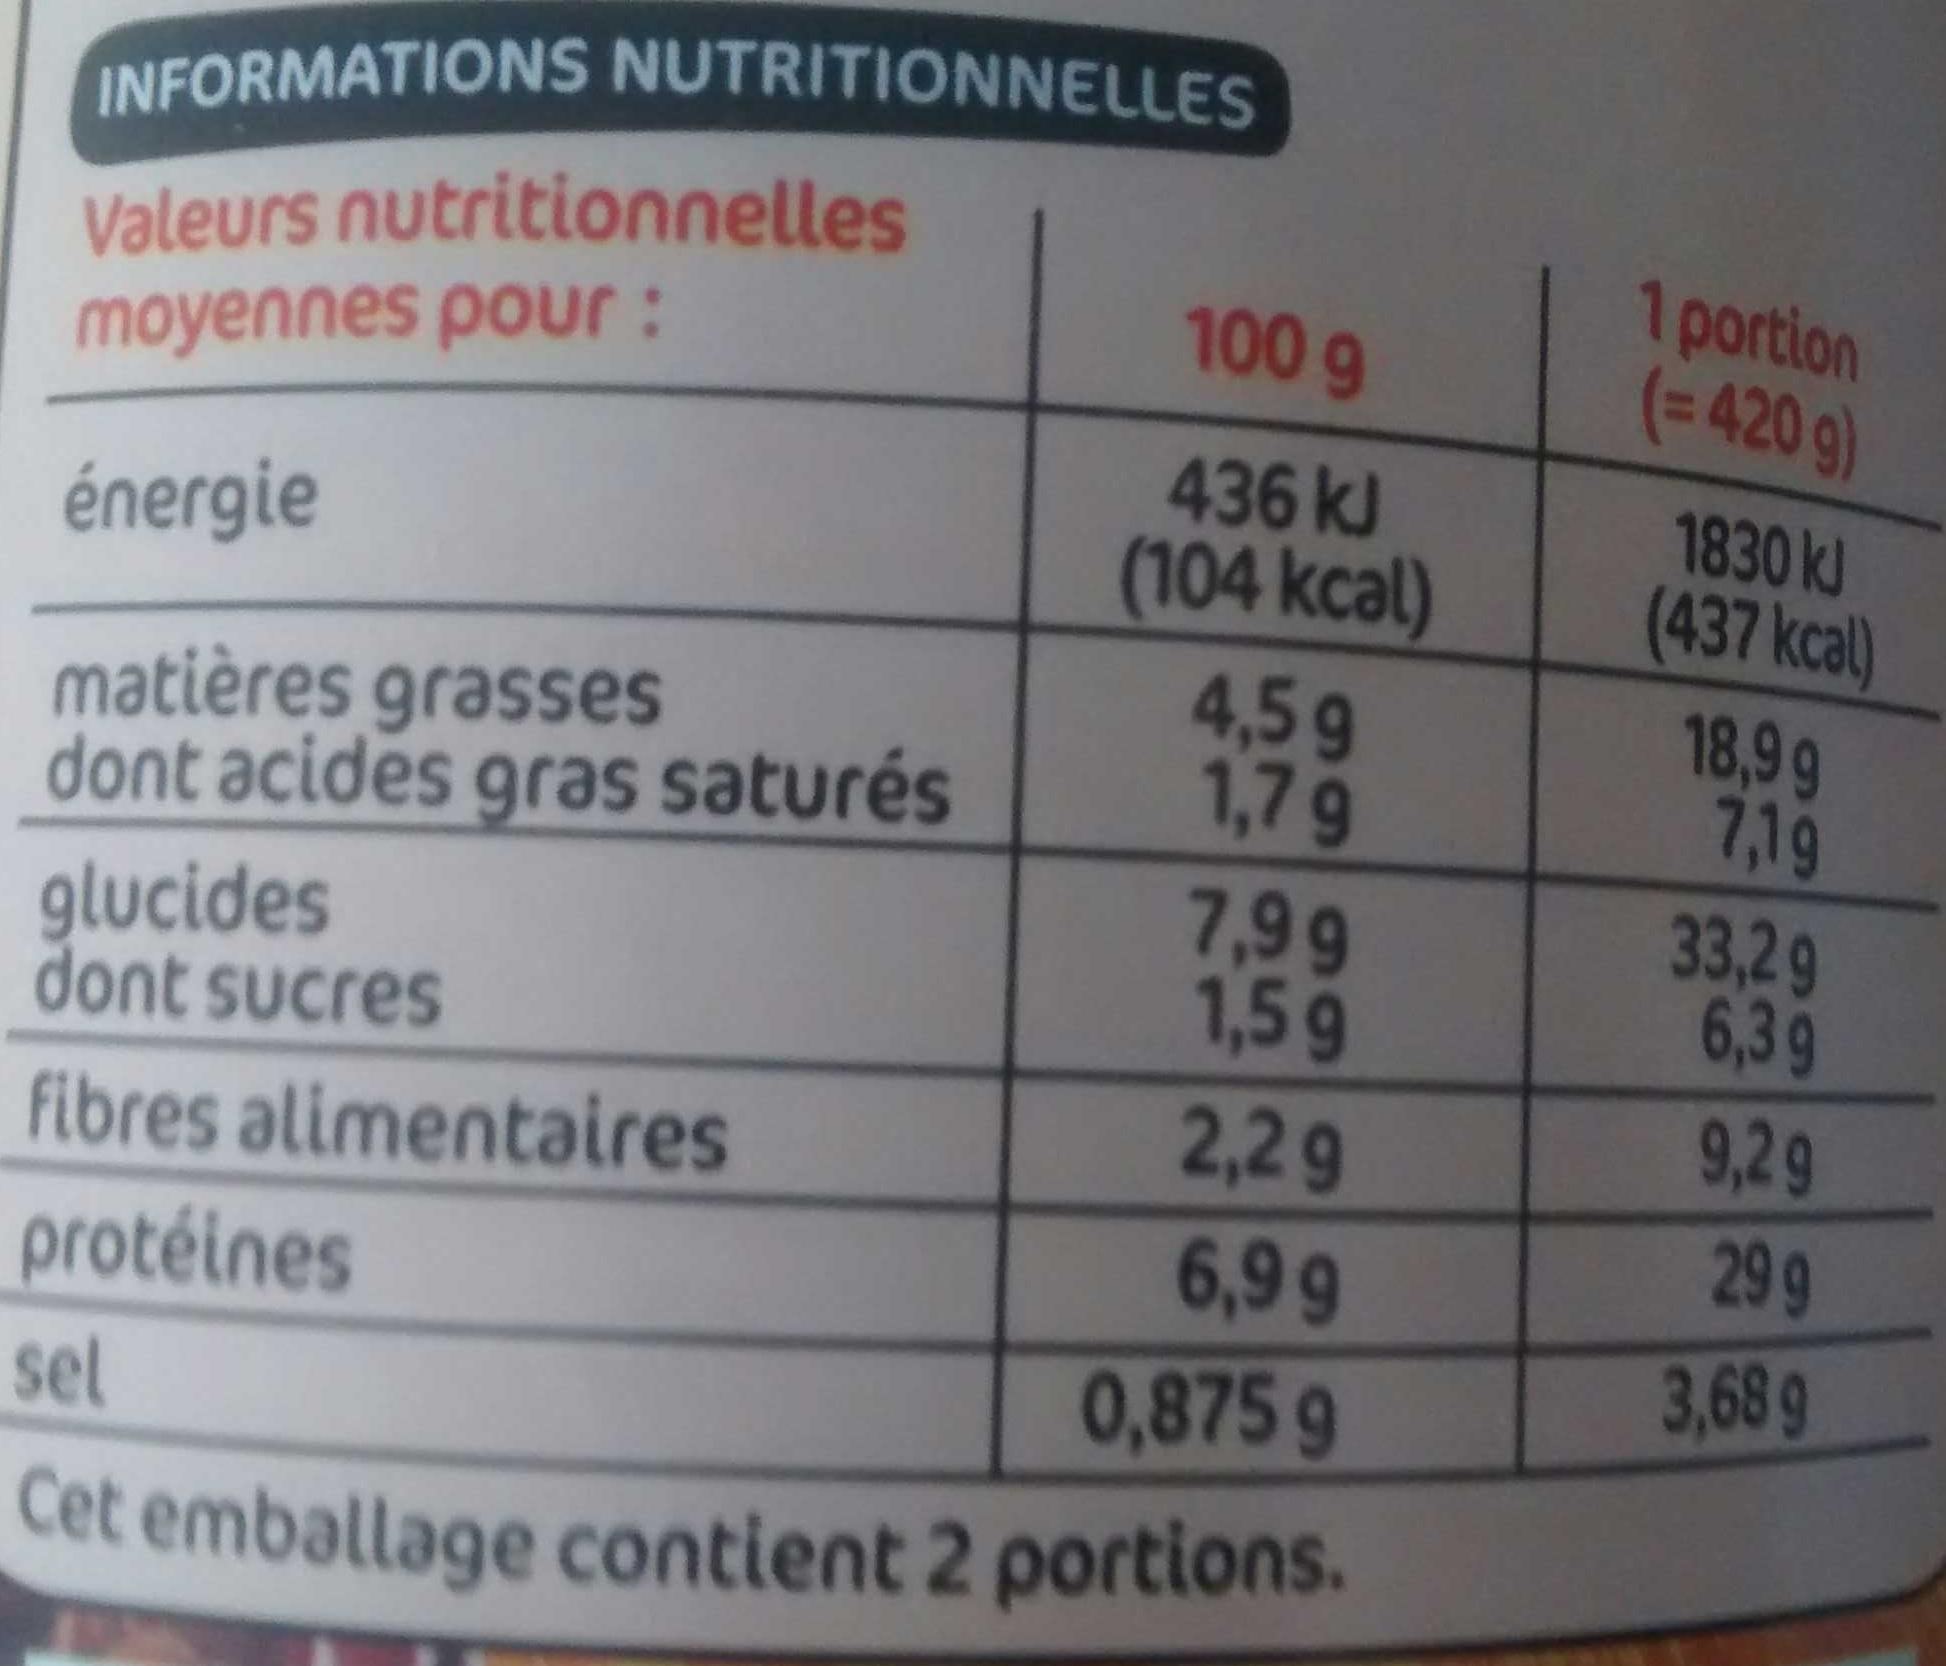 Saucisses lentilles - Voedingswaarden - fr